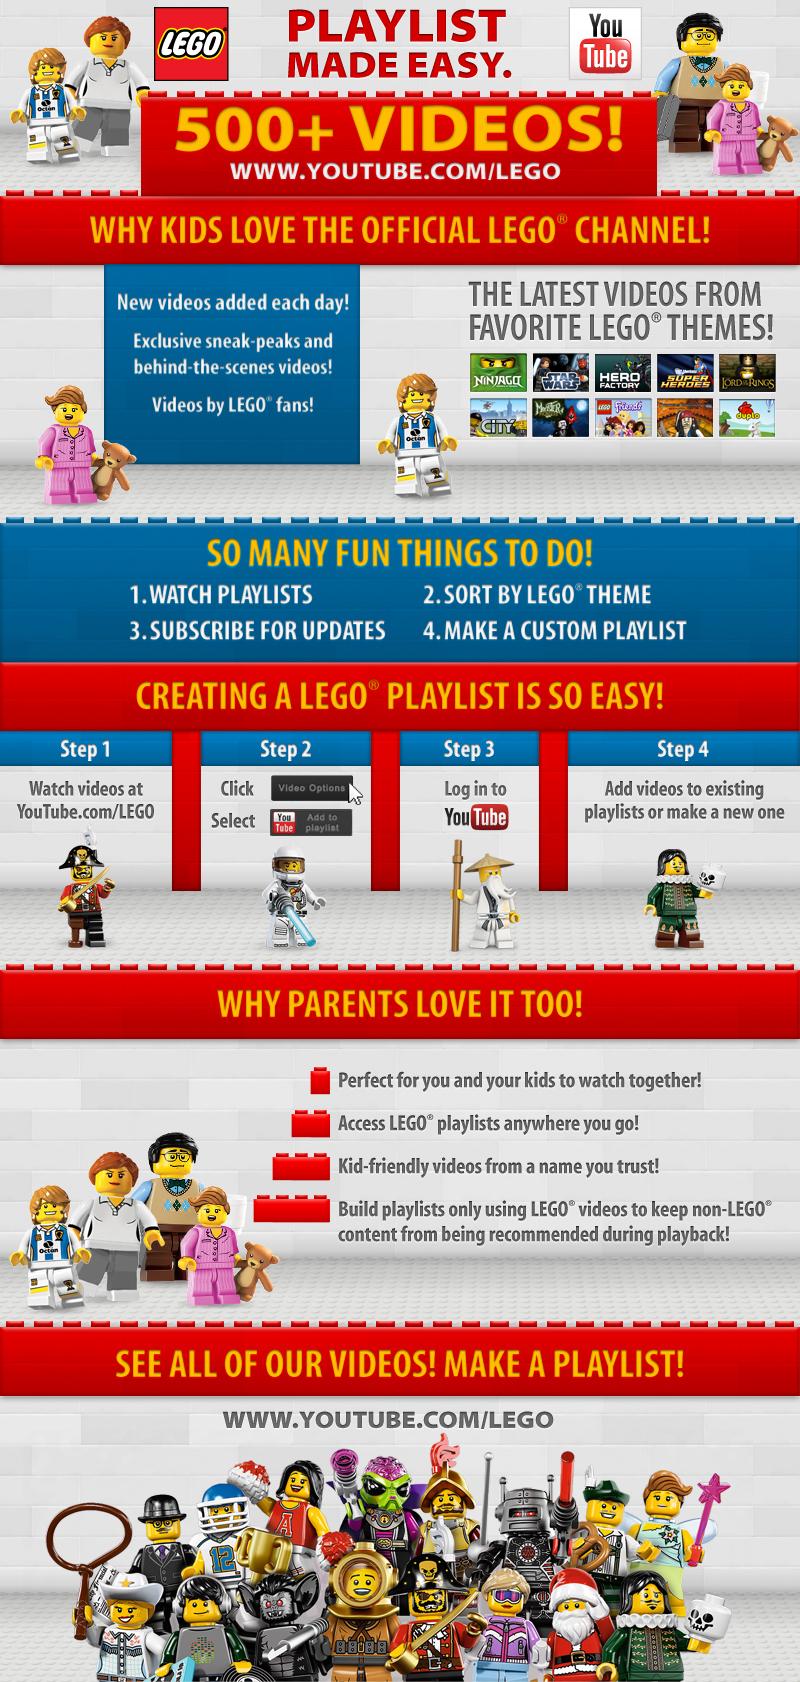 How to Create Custom LEGO Video Playlists